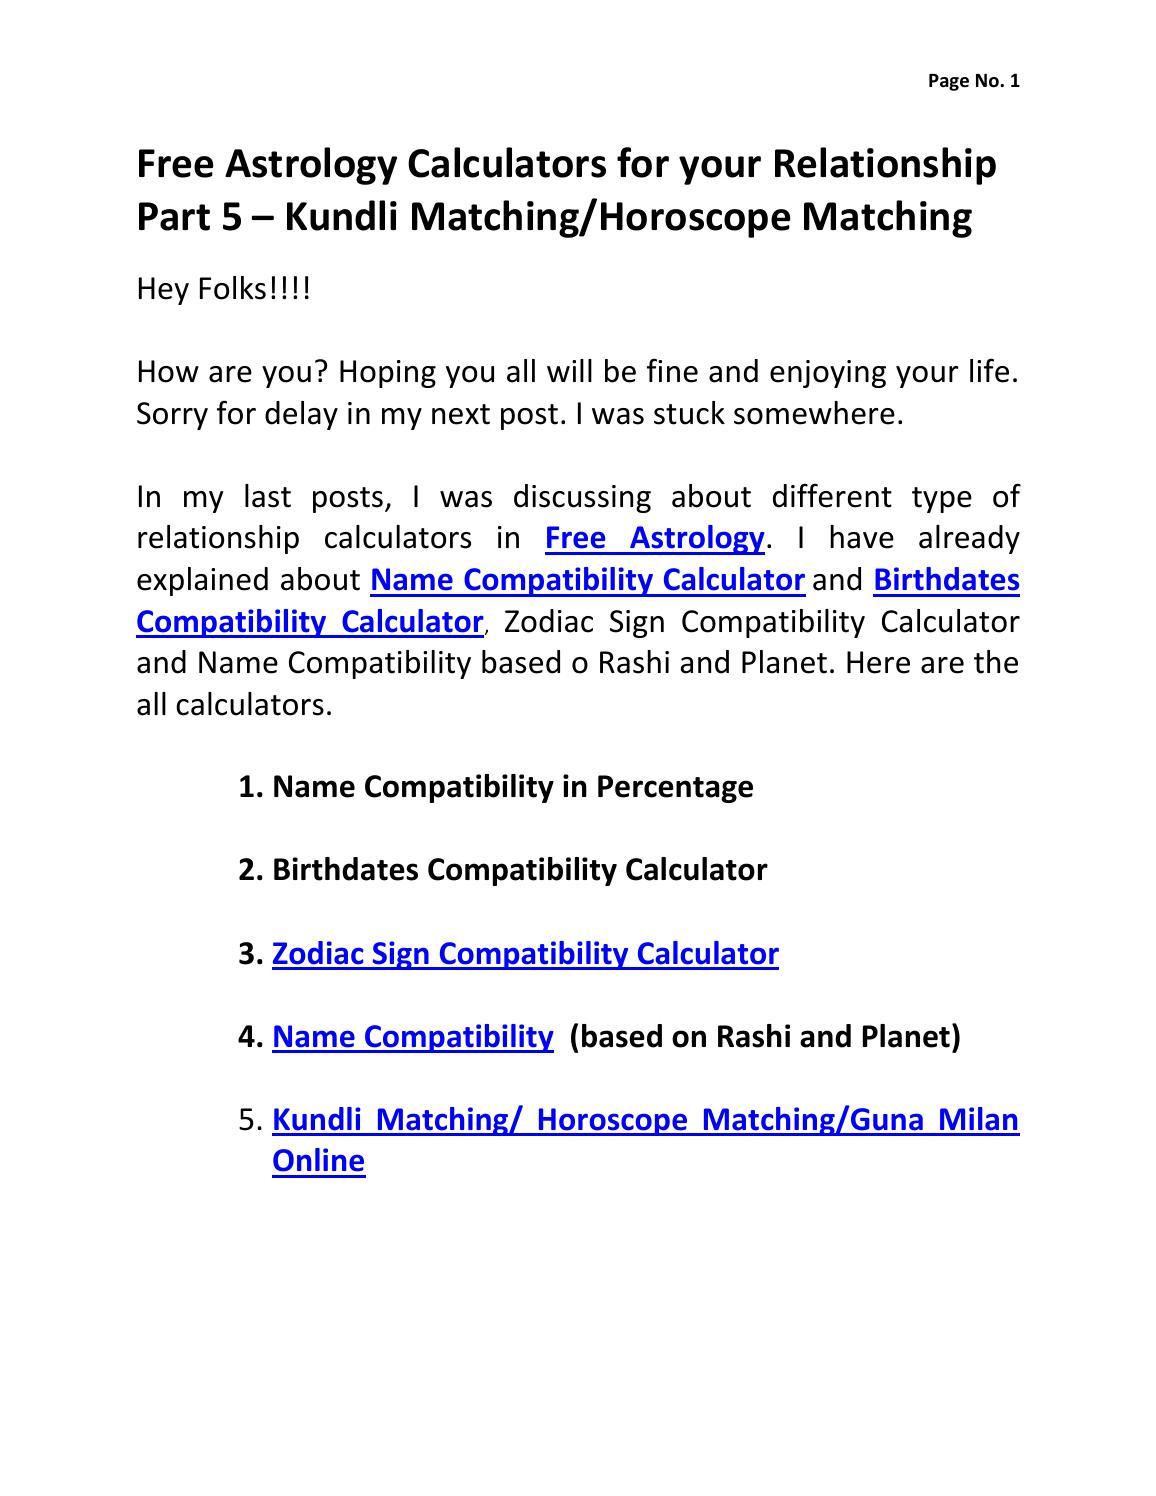 free astrology calculators for your relationship part 5 kundli